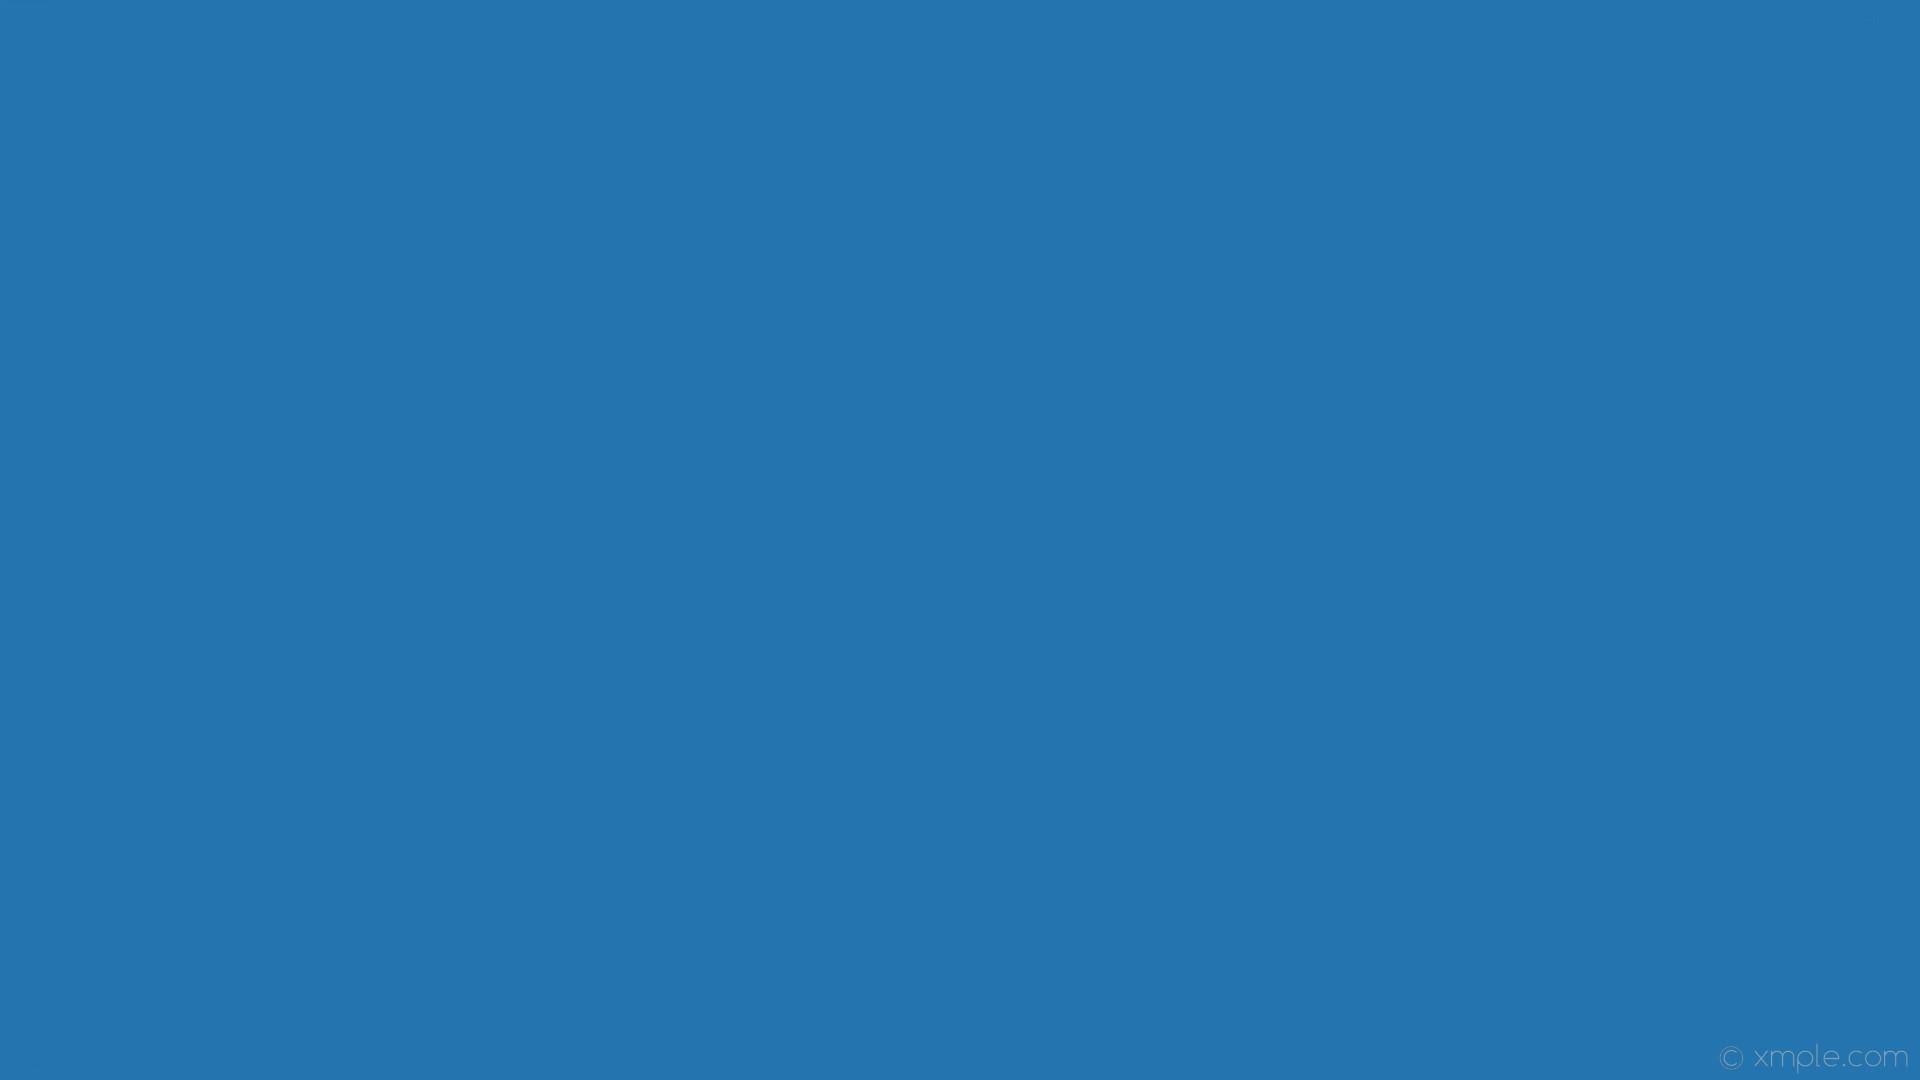 wallpaper one colour single azure plain solid color #2374af